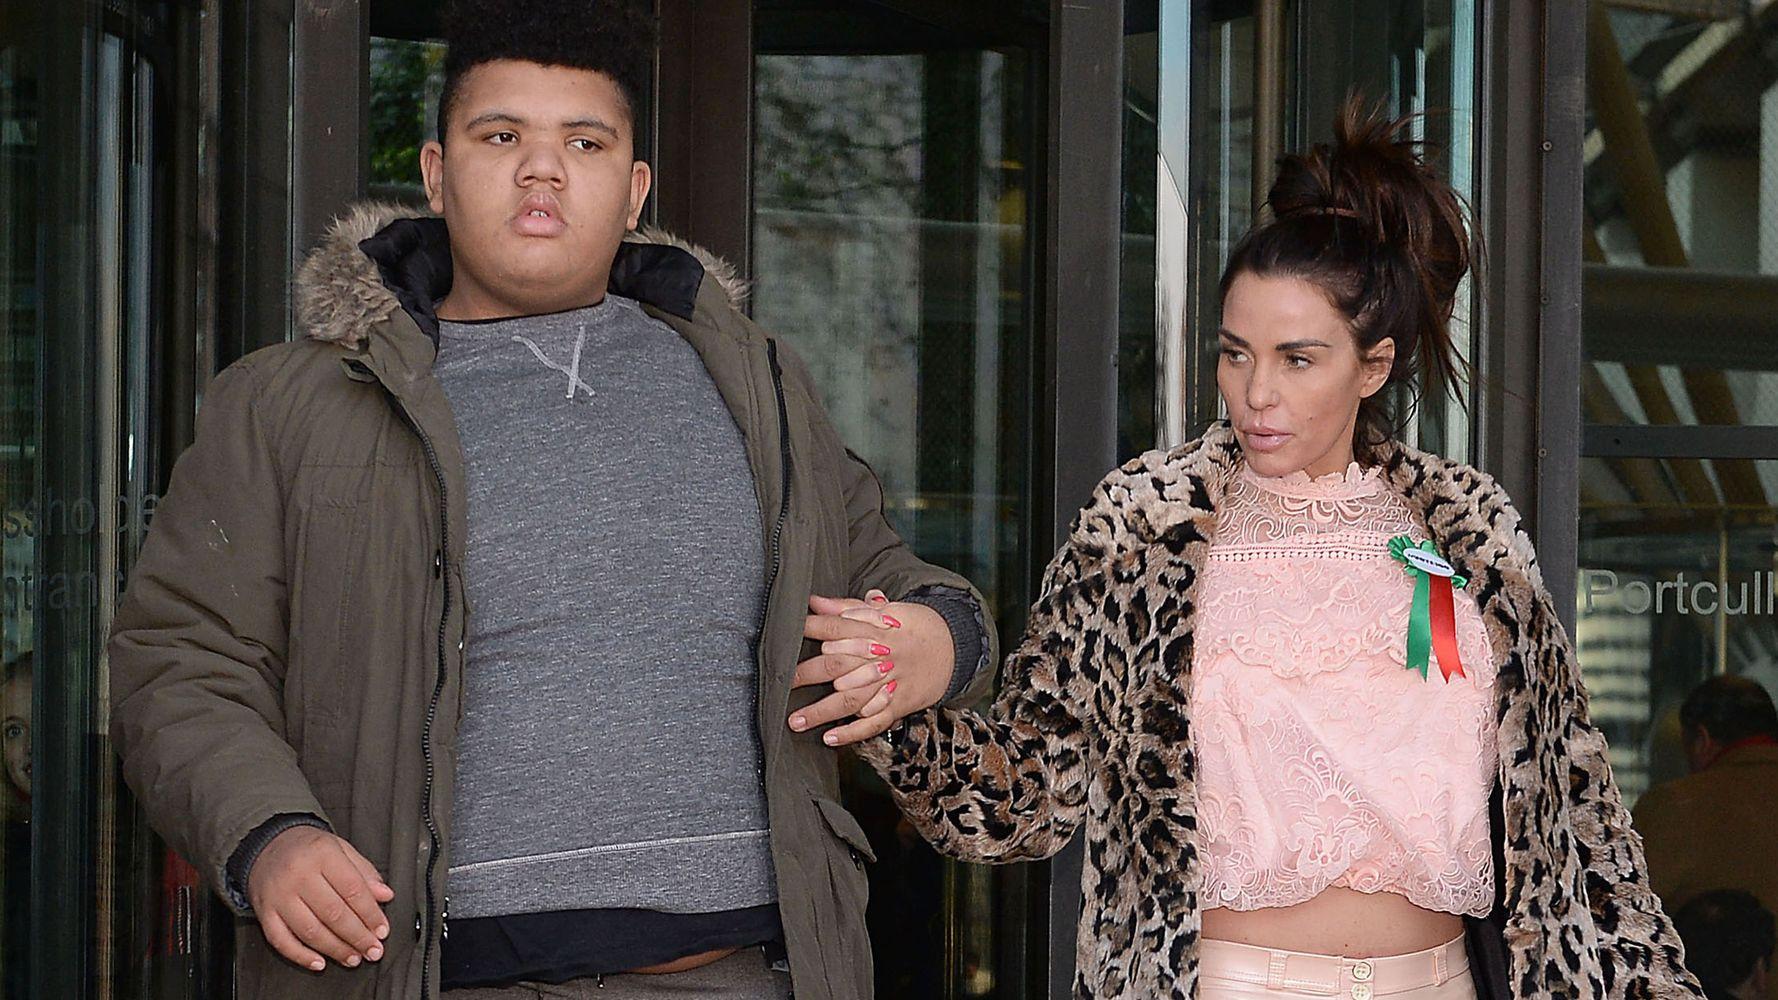 Katie Price Condemns 'Disgusting' Christmas Jumpers Mocking